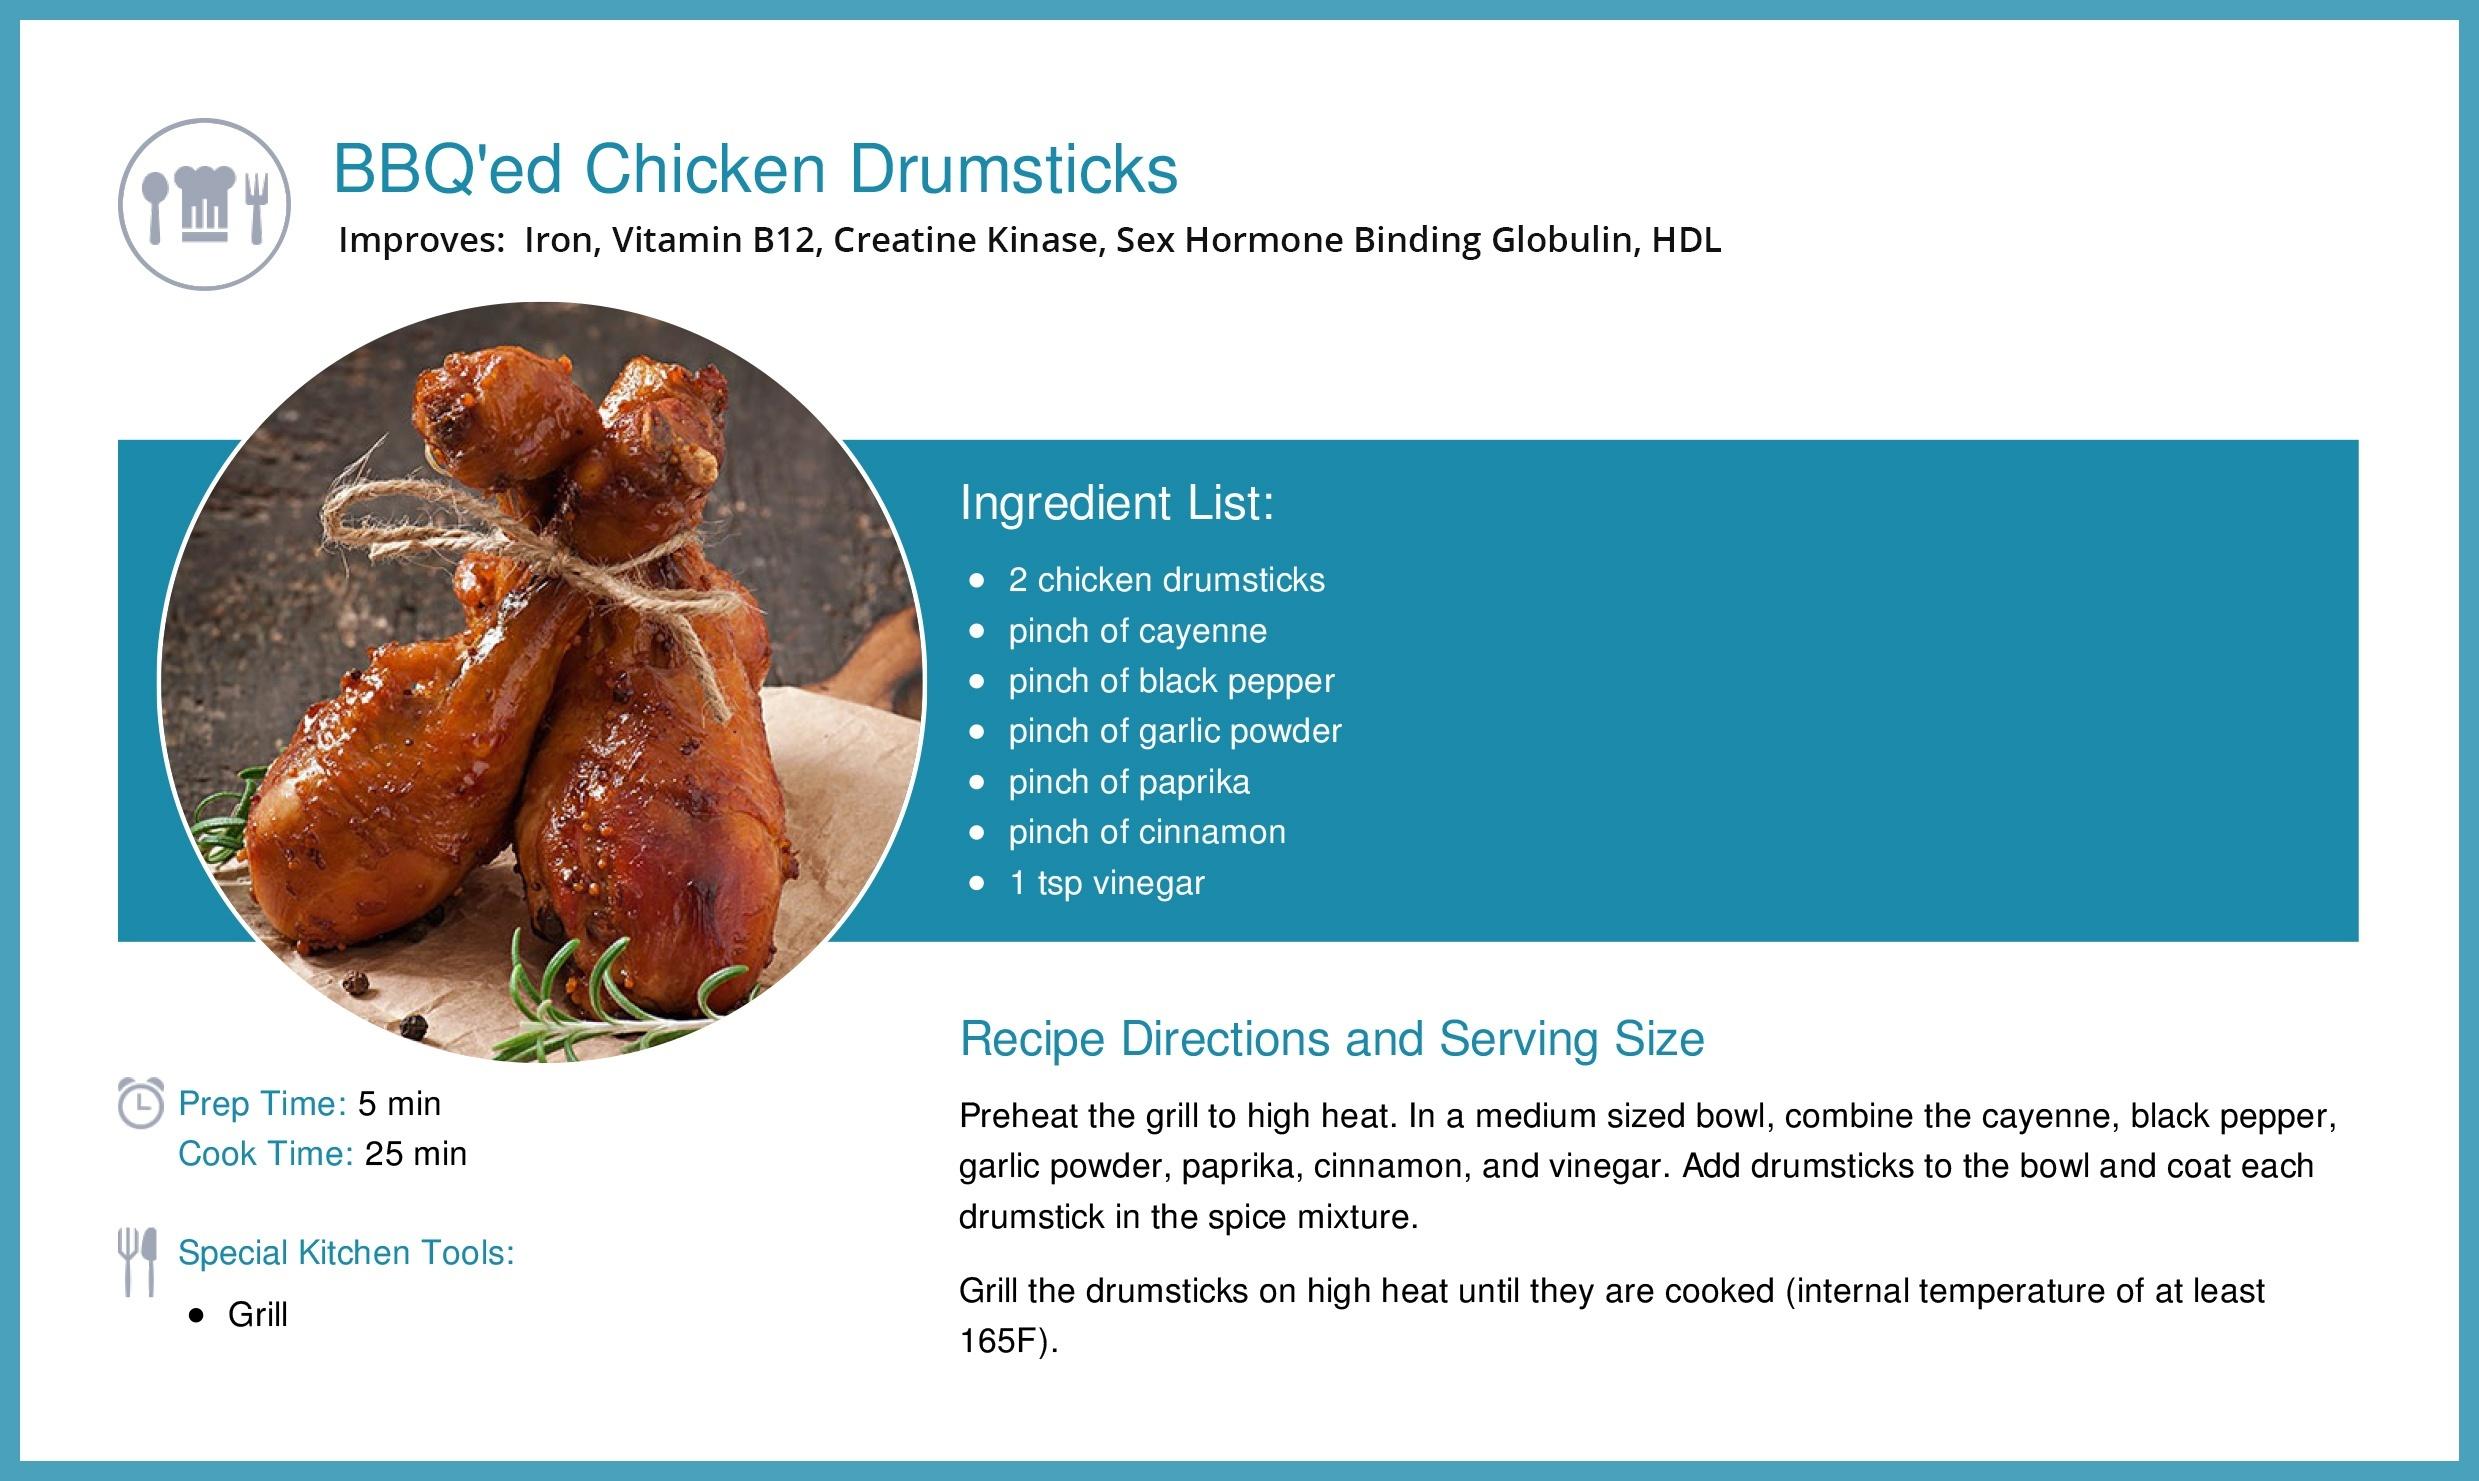 BBQed_Chicken_Drumsticks_updted.jpg